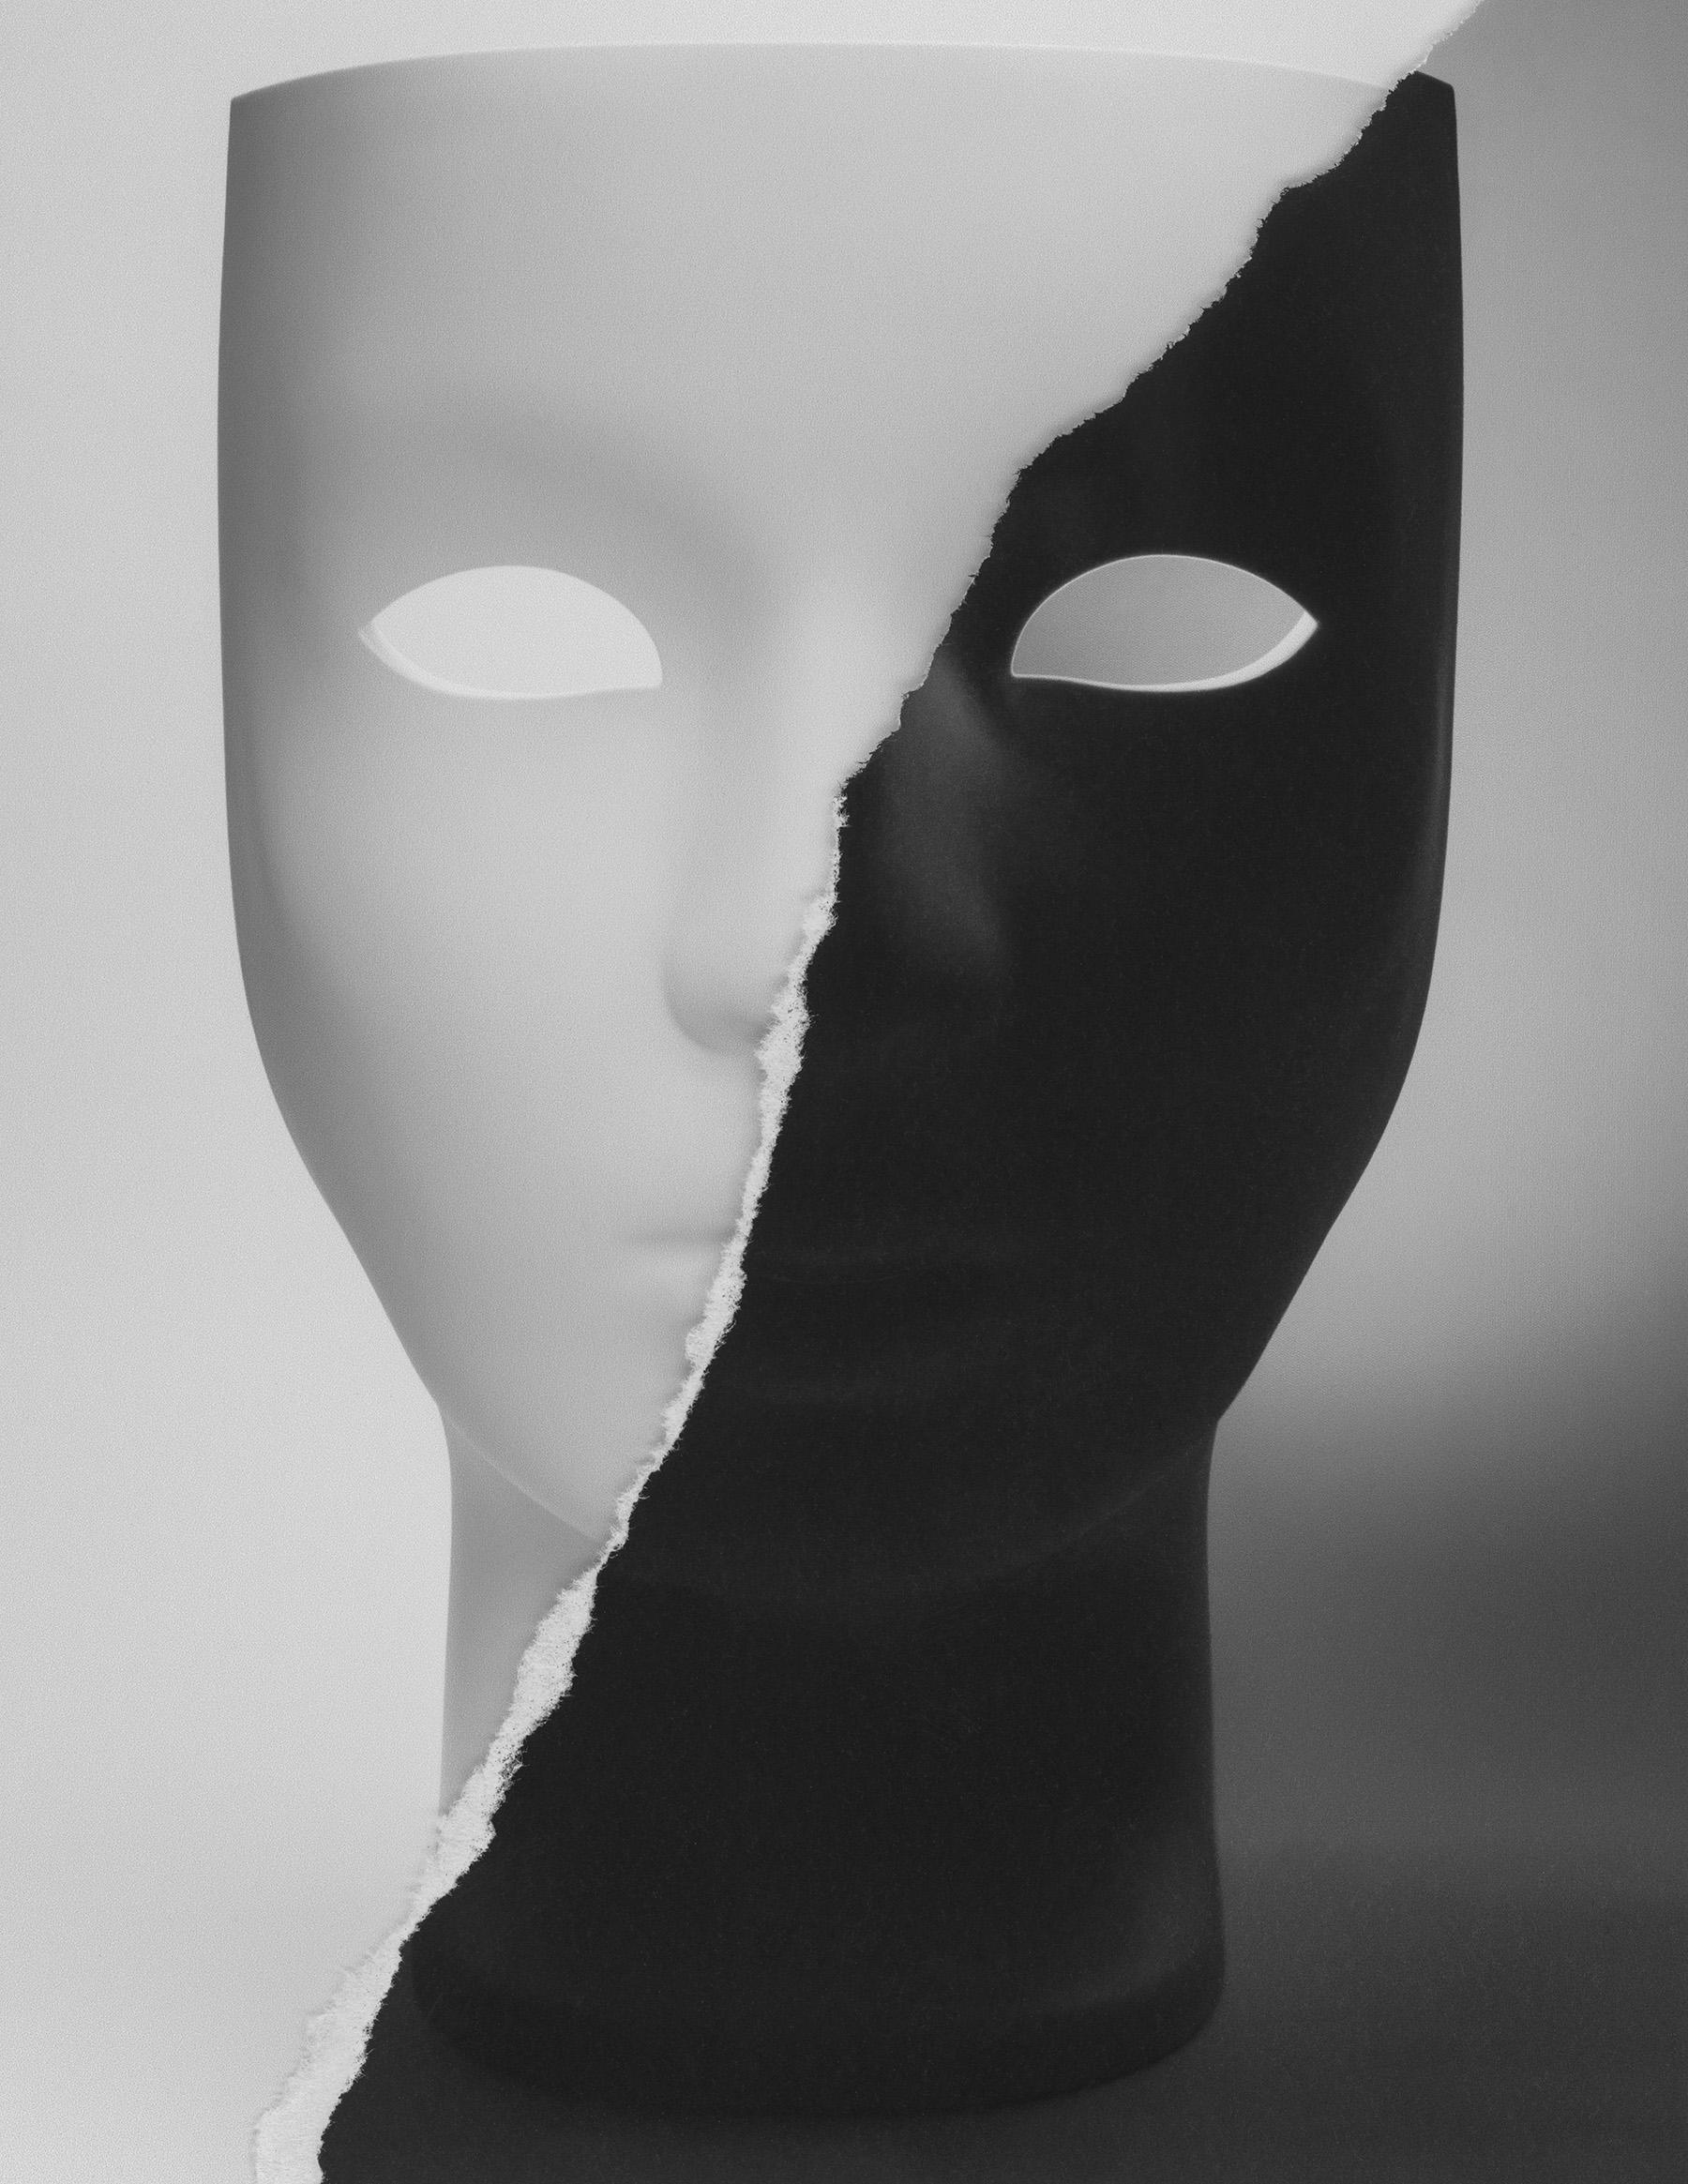 IGNANT-Alexander Kilian--NEMO-CHAIR-01